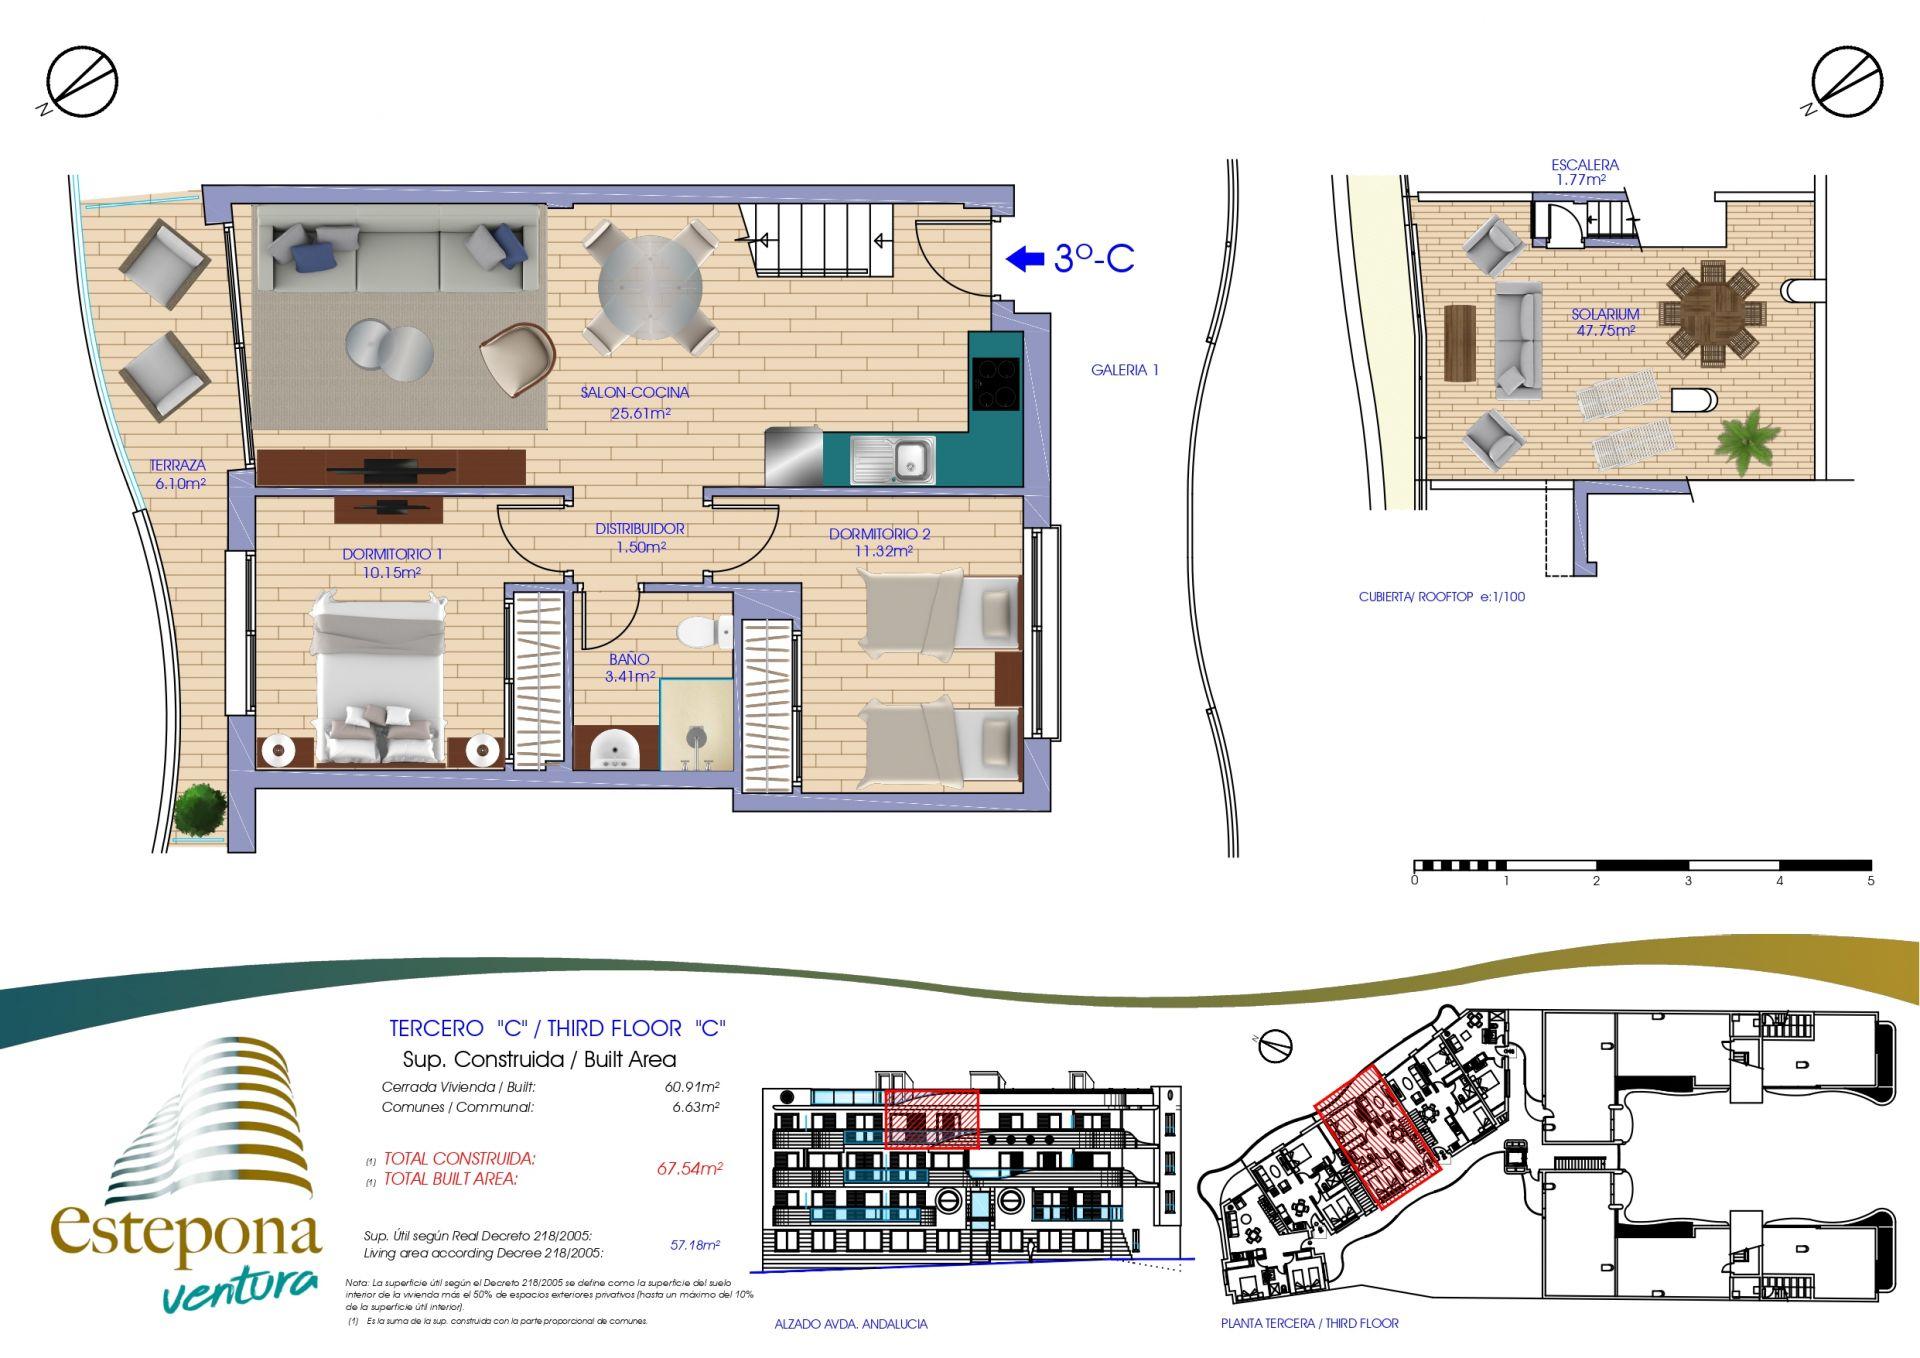 3c - Ventura Estepona | Compra de casa en Estepona